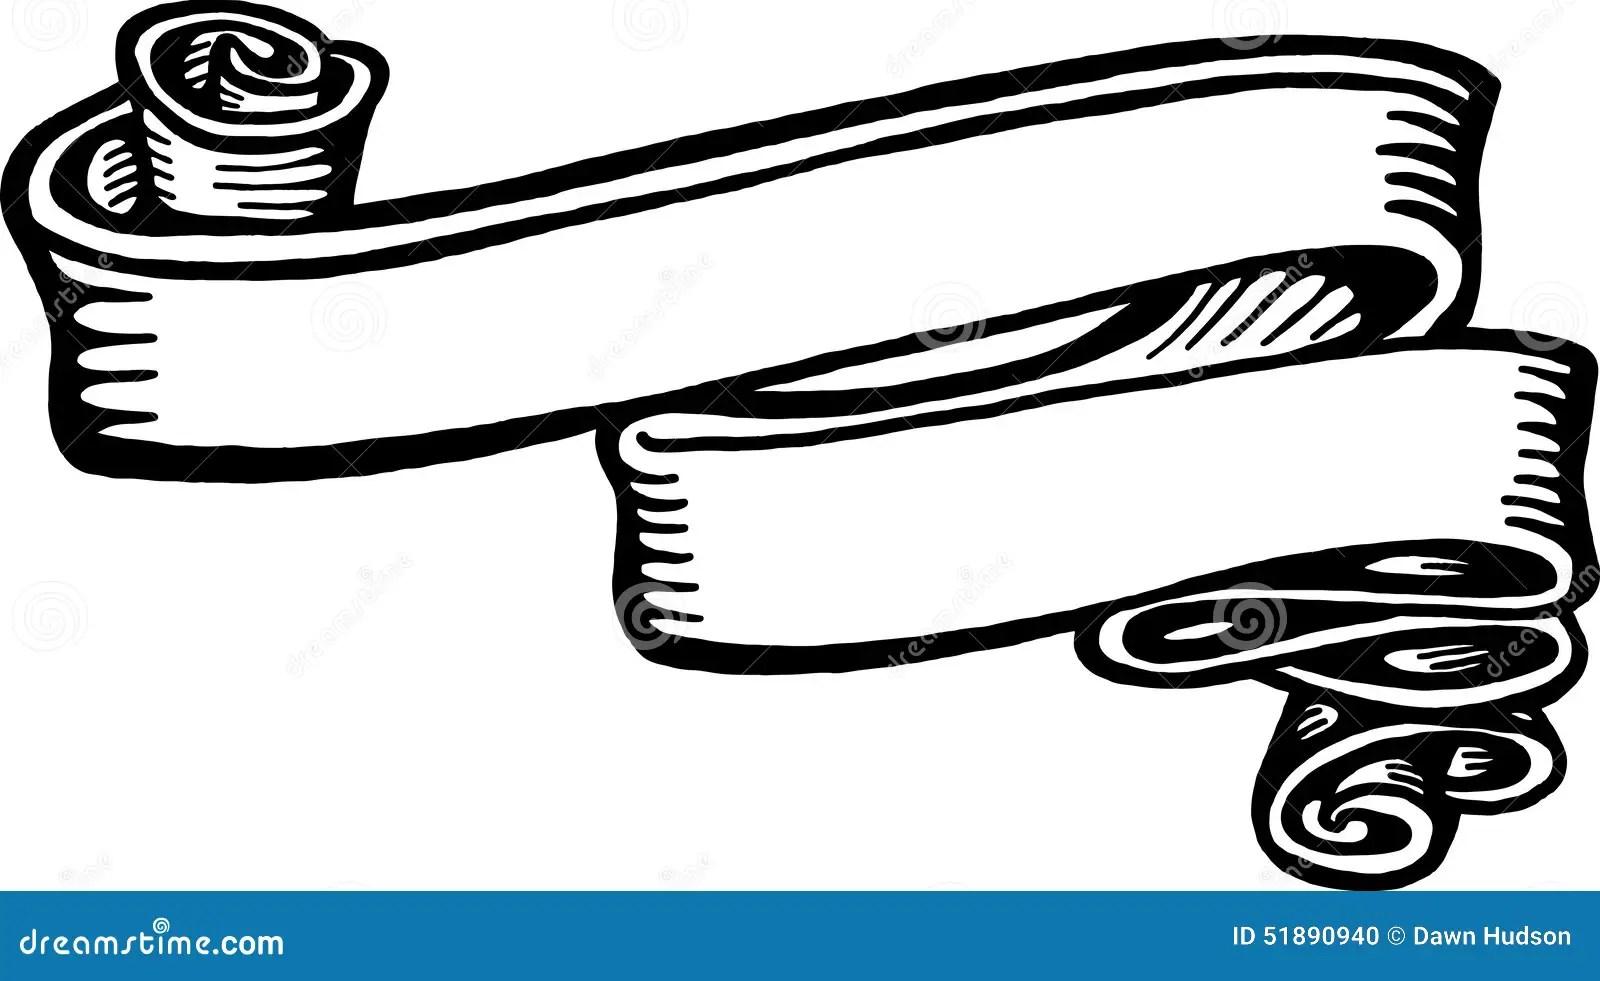 Banner Ribbon Stock Illustration